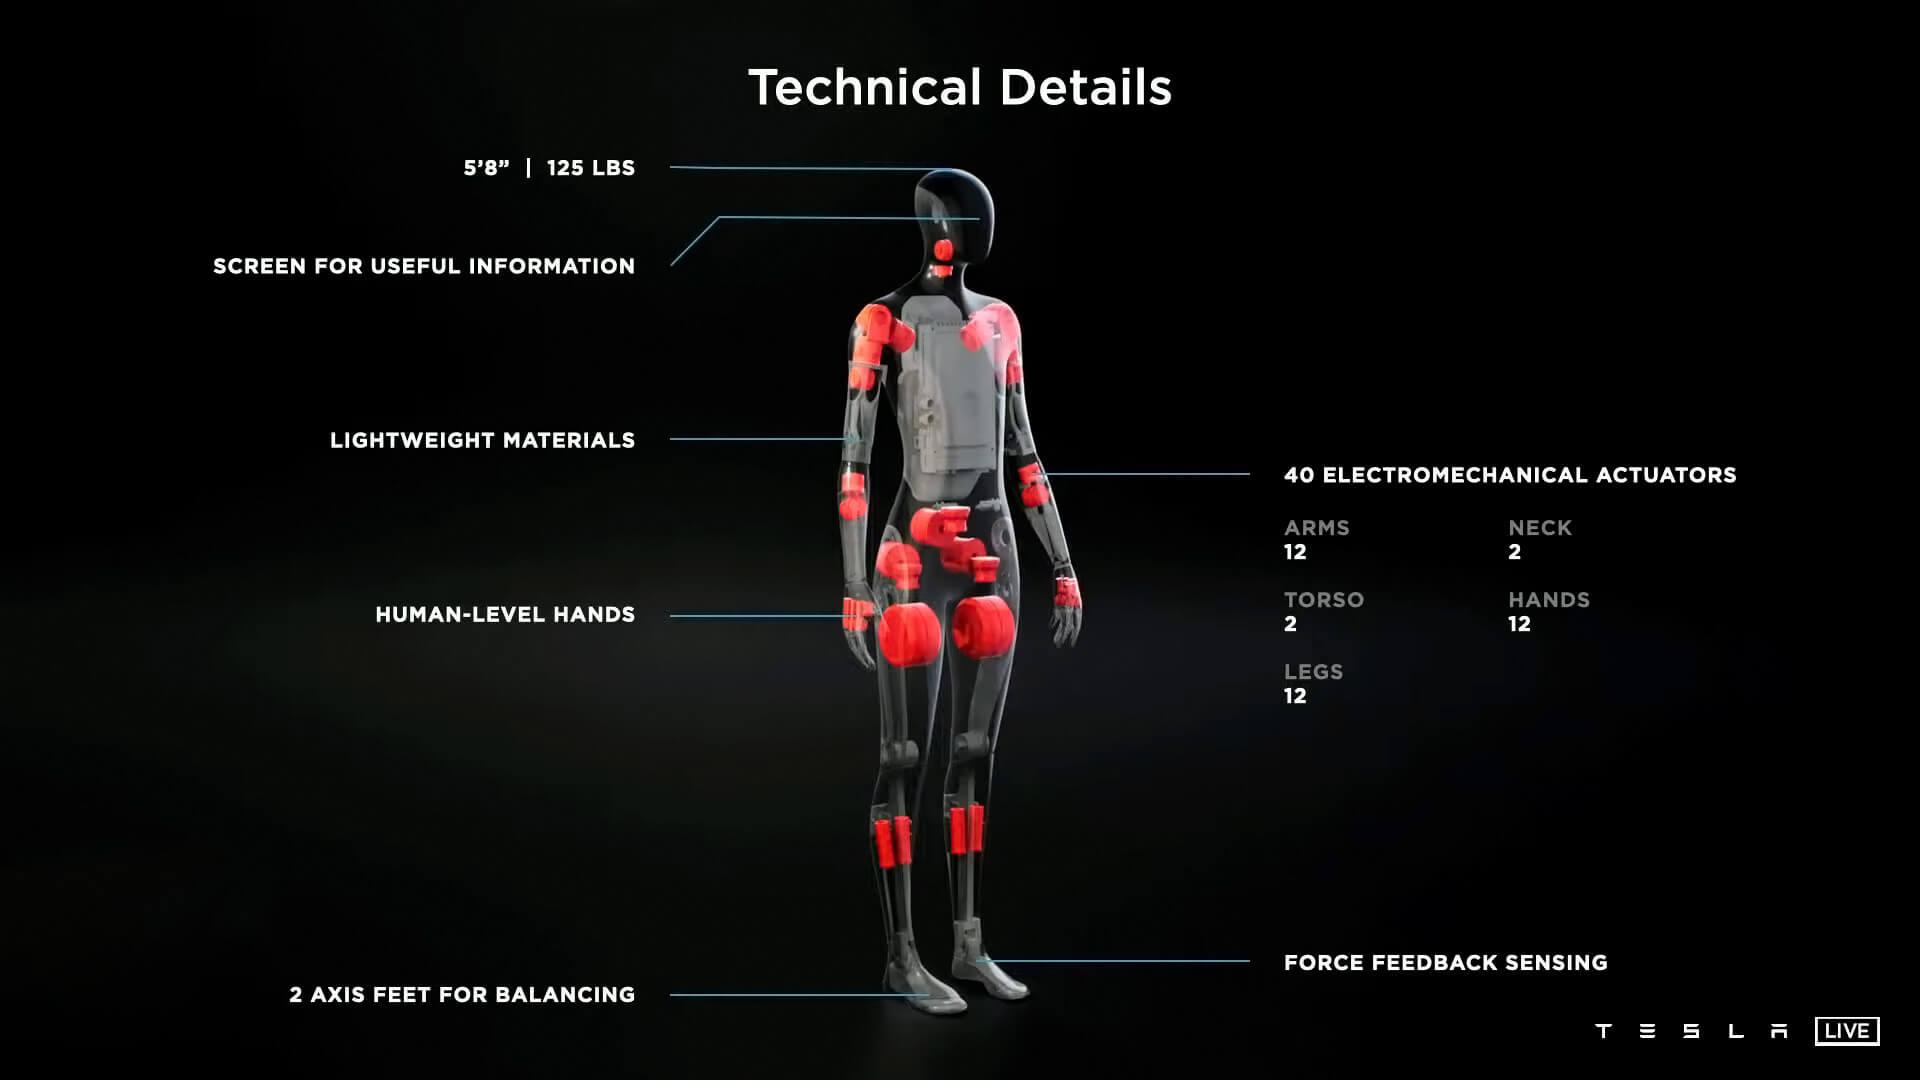 Характеристики робота-гуманоида Tesla